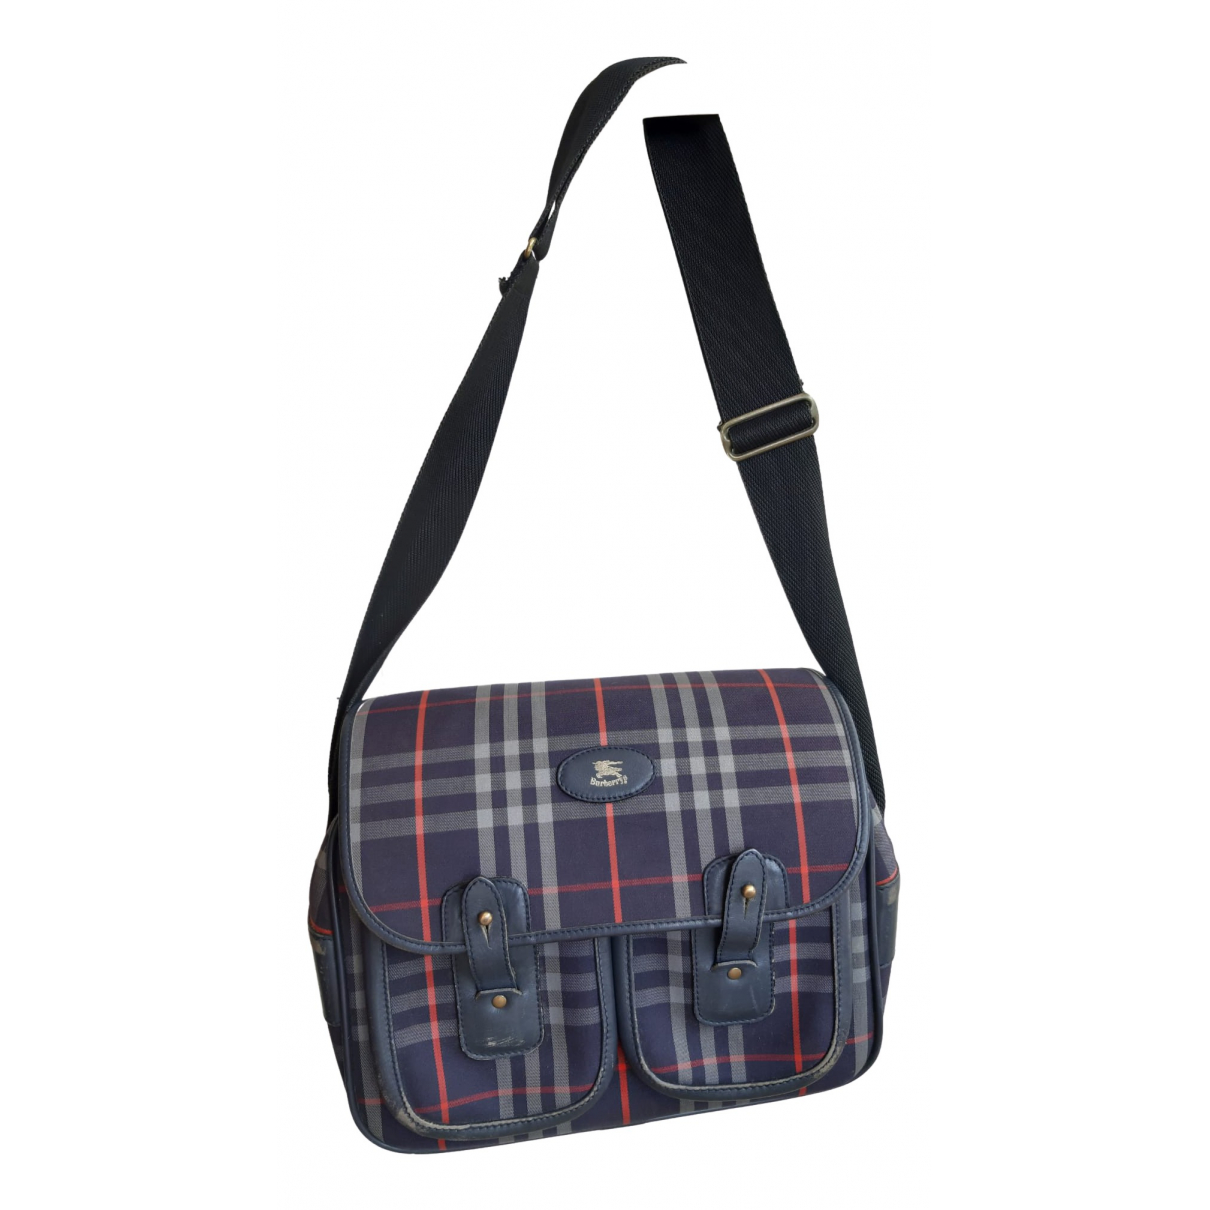 Burberry \N Blue Cloth handbag for Women \N